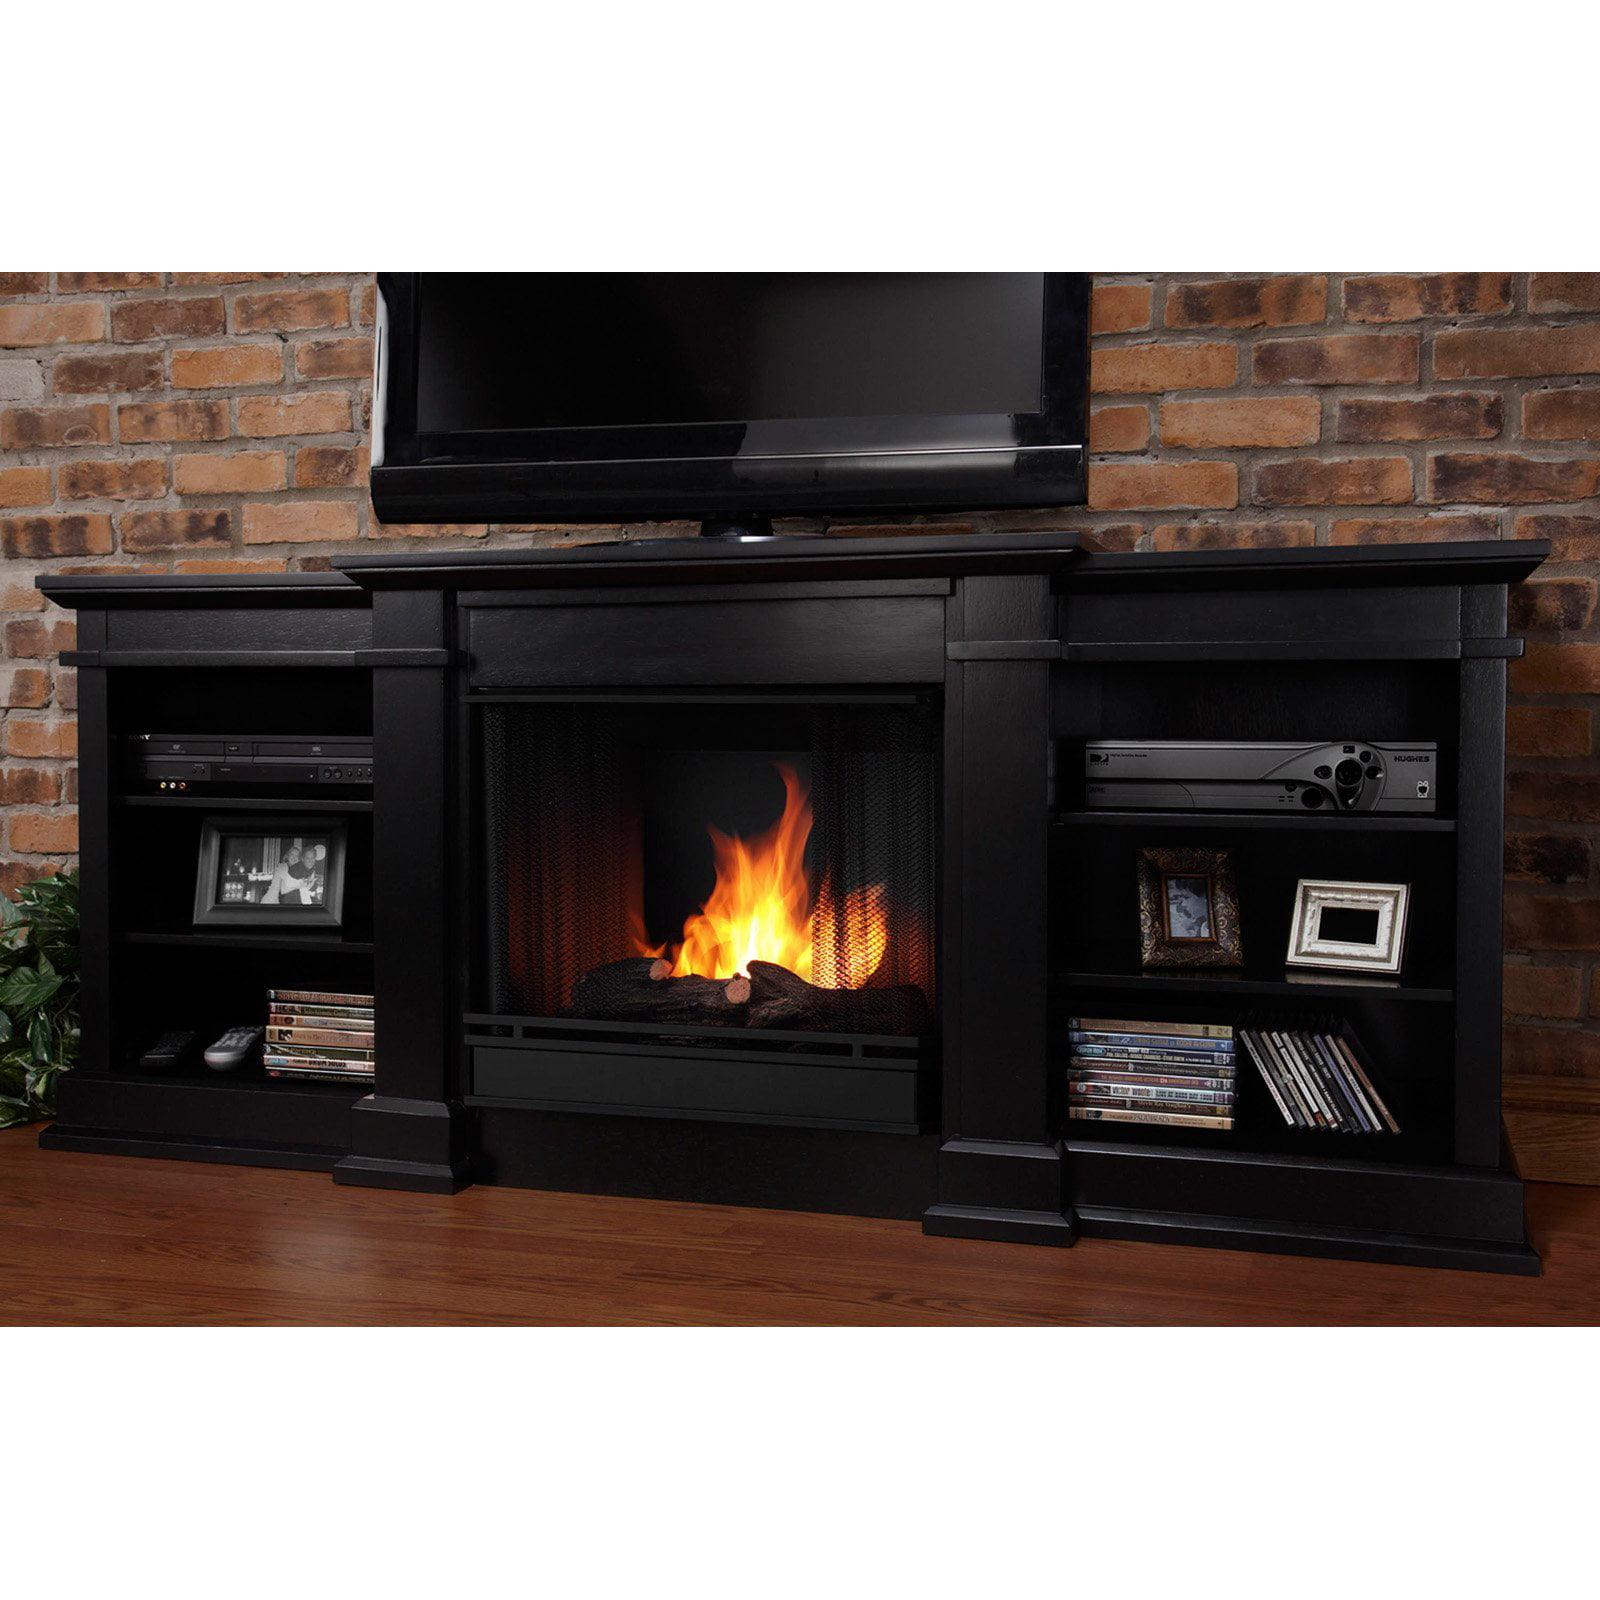 Real Flame Fresno Ventless Gel Fireplace - Black